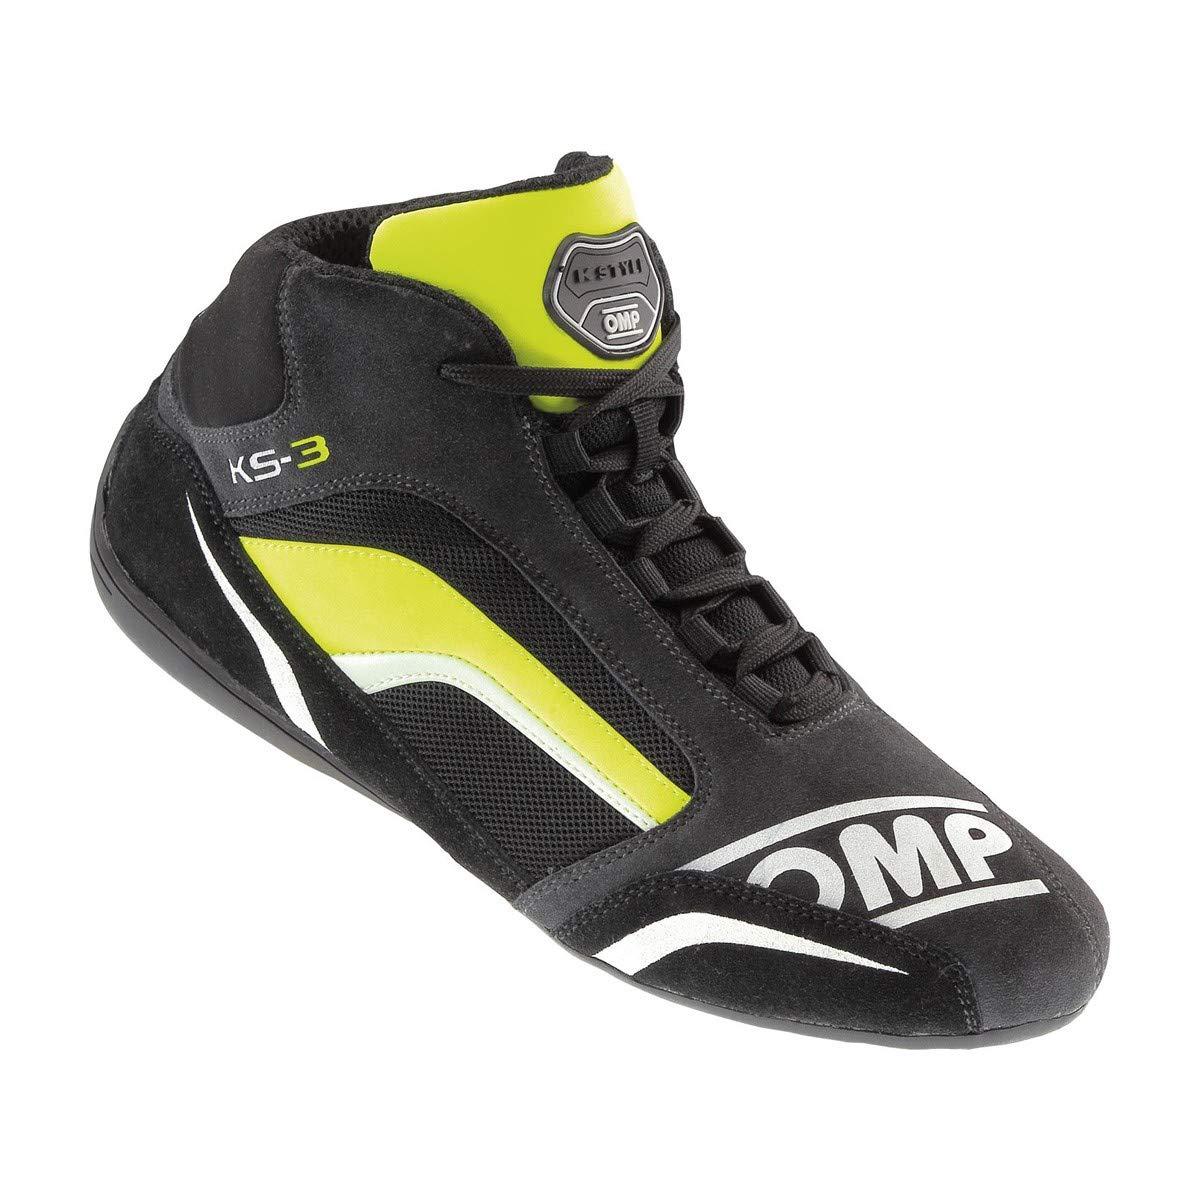 OMP Unisex-Adult KS-3 Shoes (Anthracite/Yellow, 42)